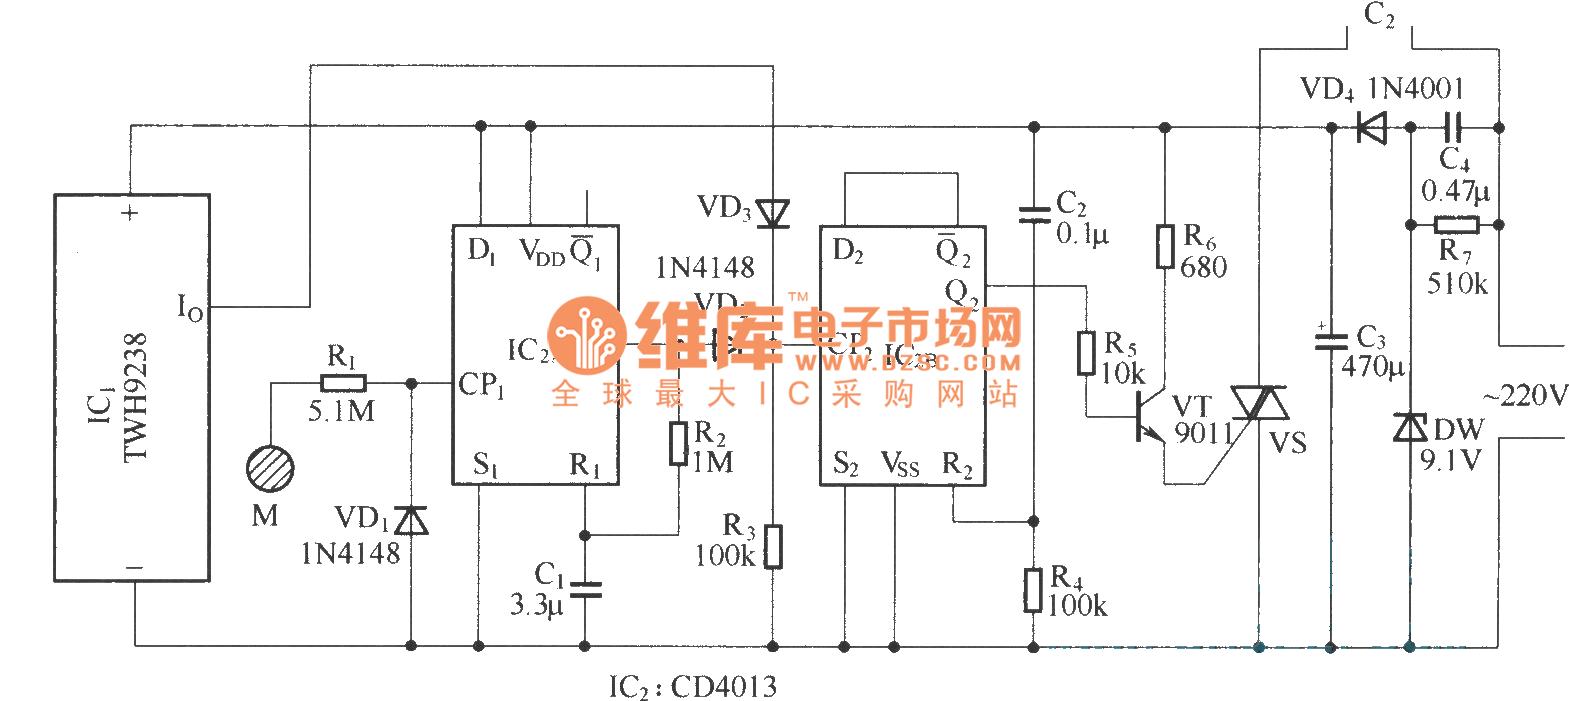 Http Wwwseekiccom Circuitdiagram Basiccircuit Analogcircuit